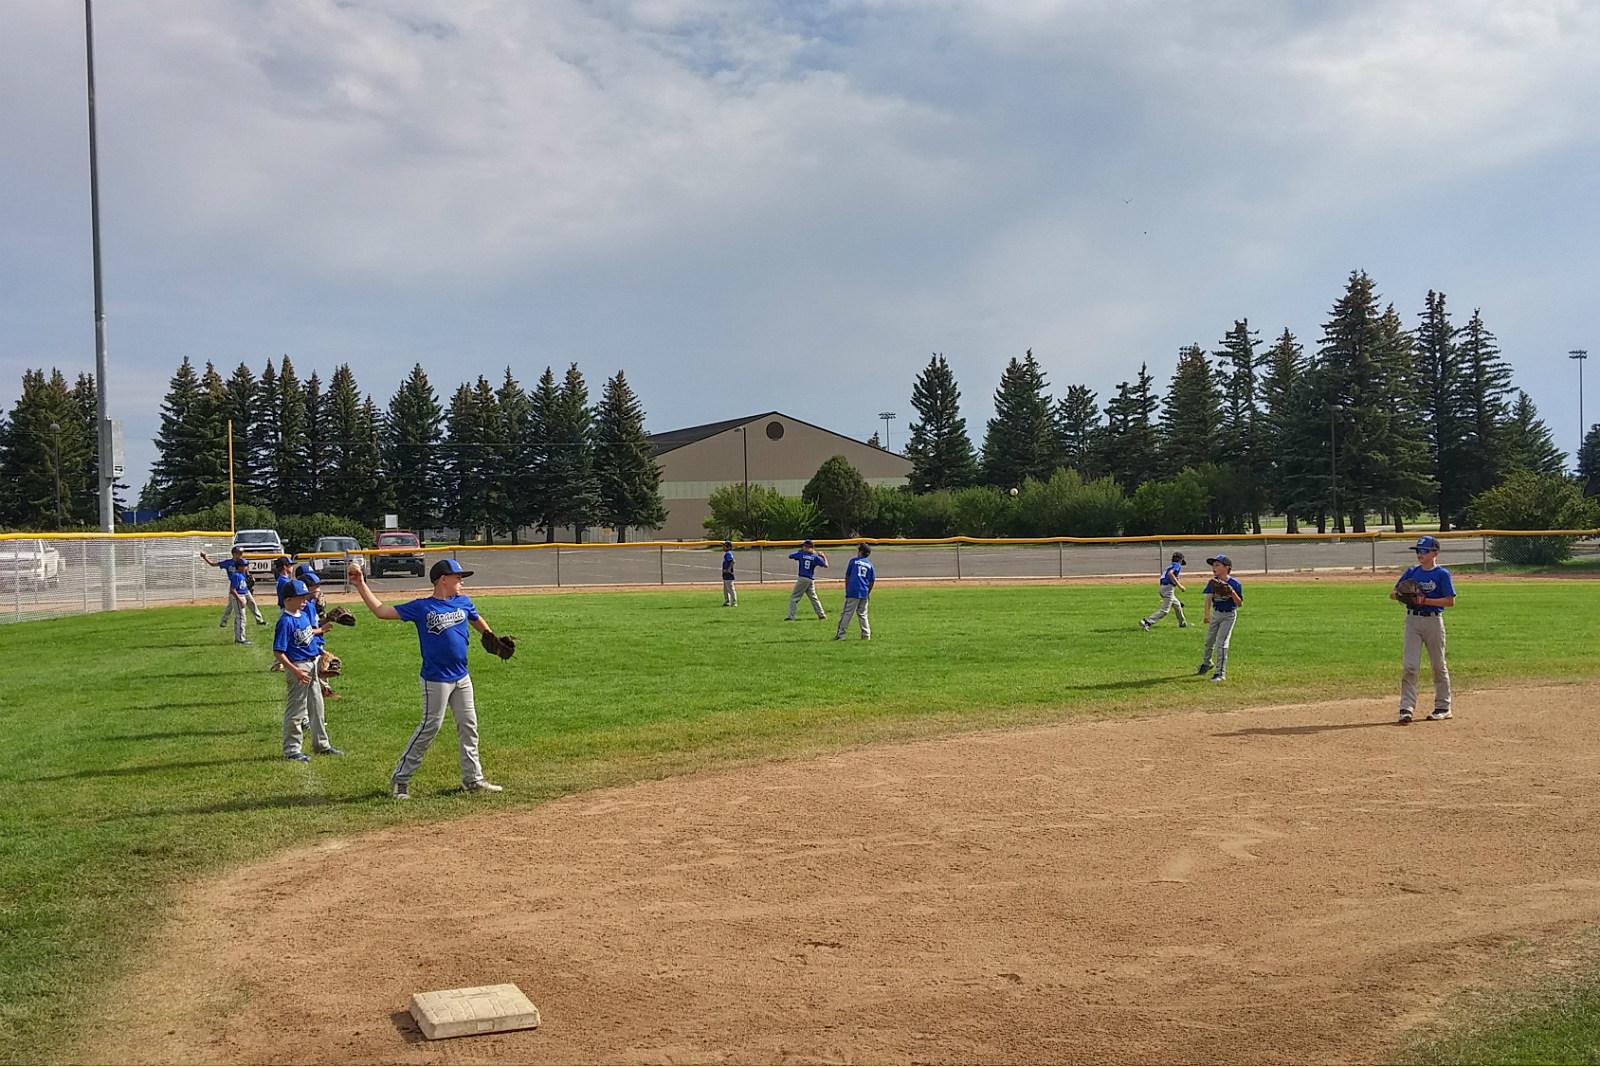 Laramie 9-10 All-Stars, practice, baseball, Little League, 2017